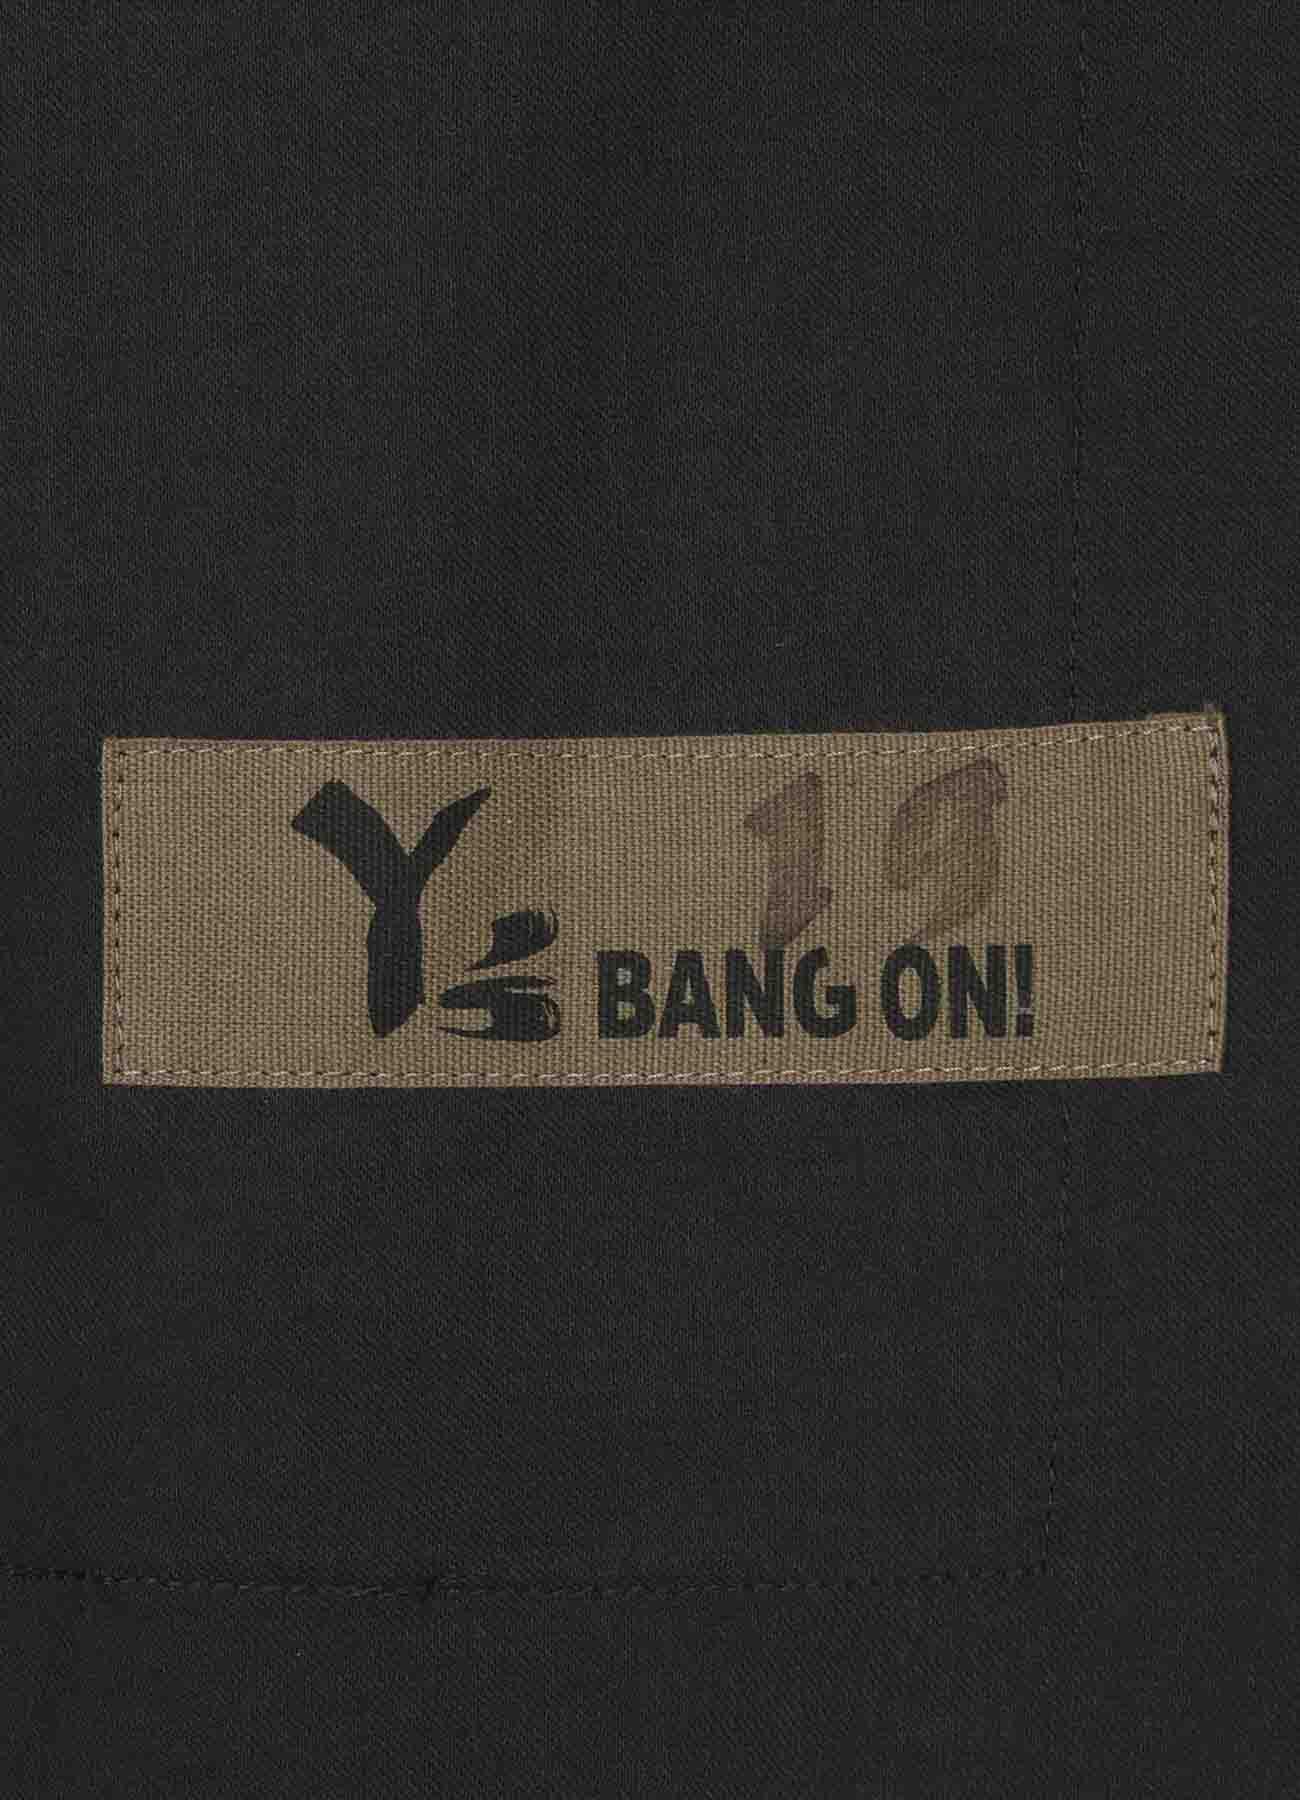 No.19羊毛薄布料吊带裤